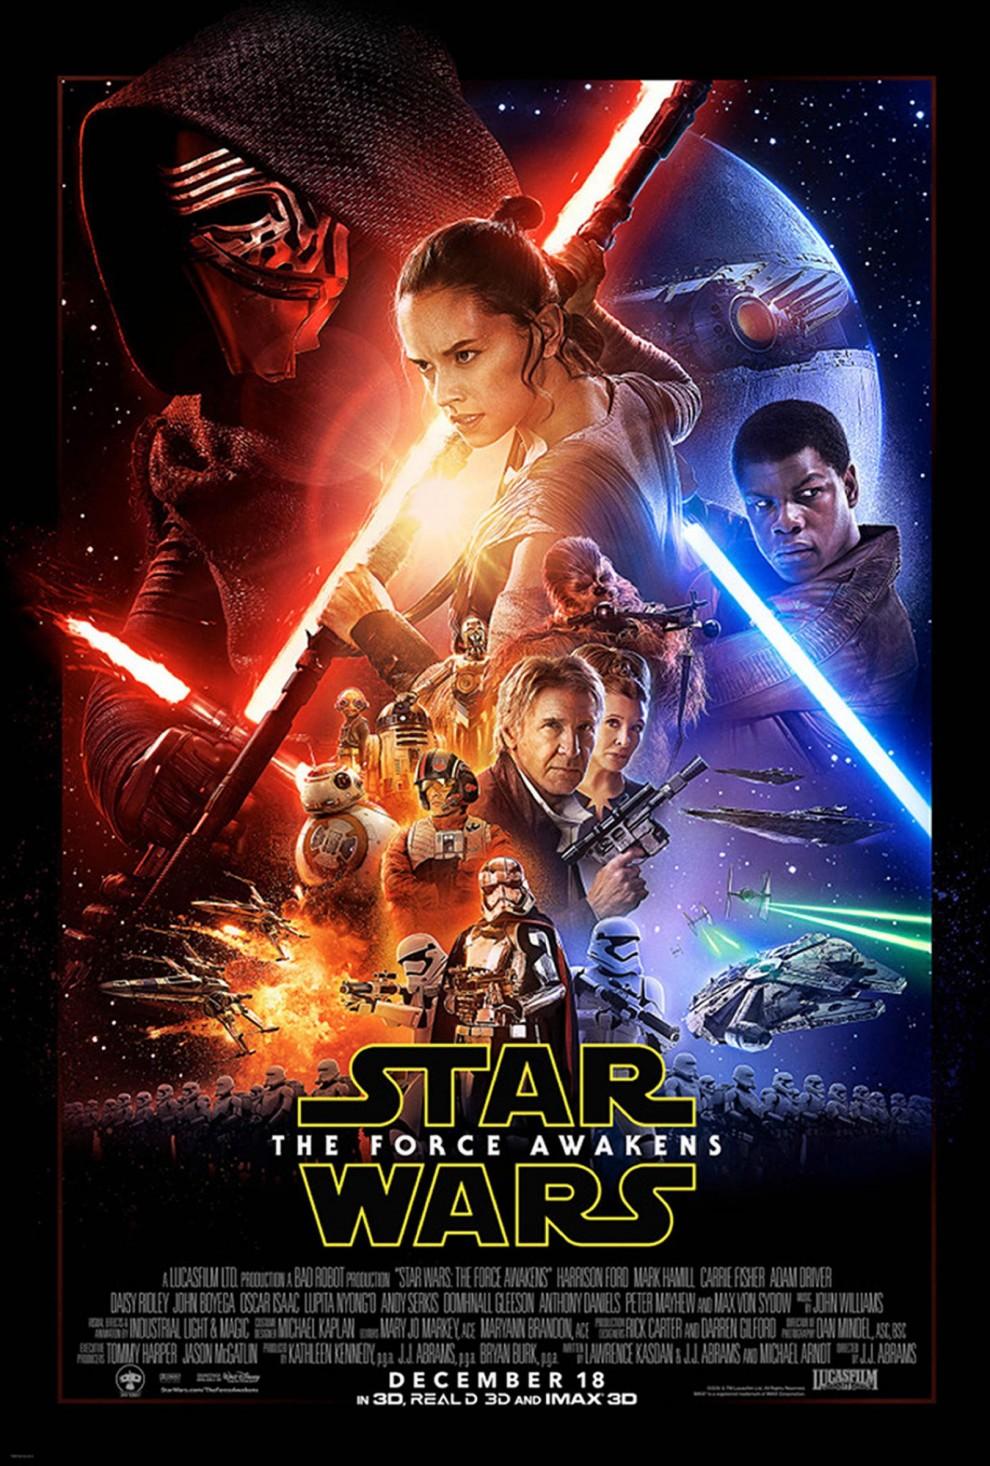 Star War Episode VII: The Force Awakens